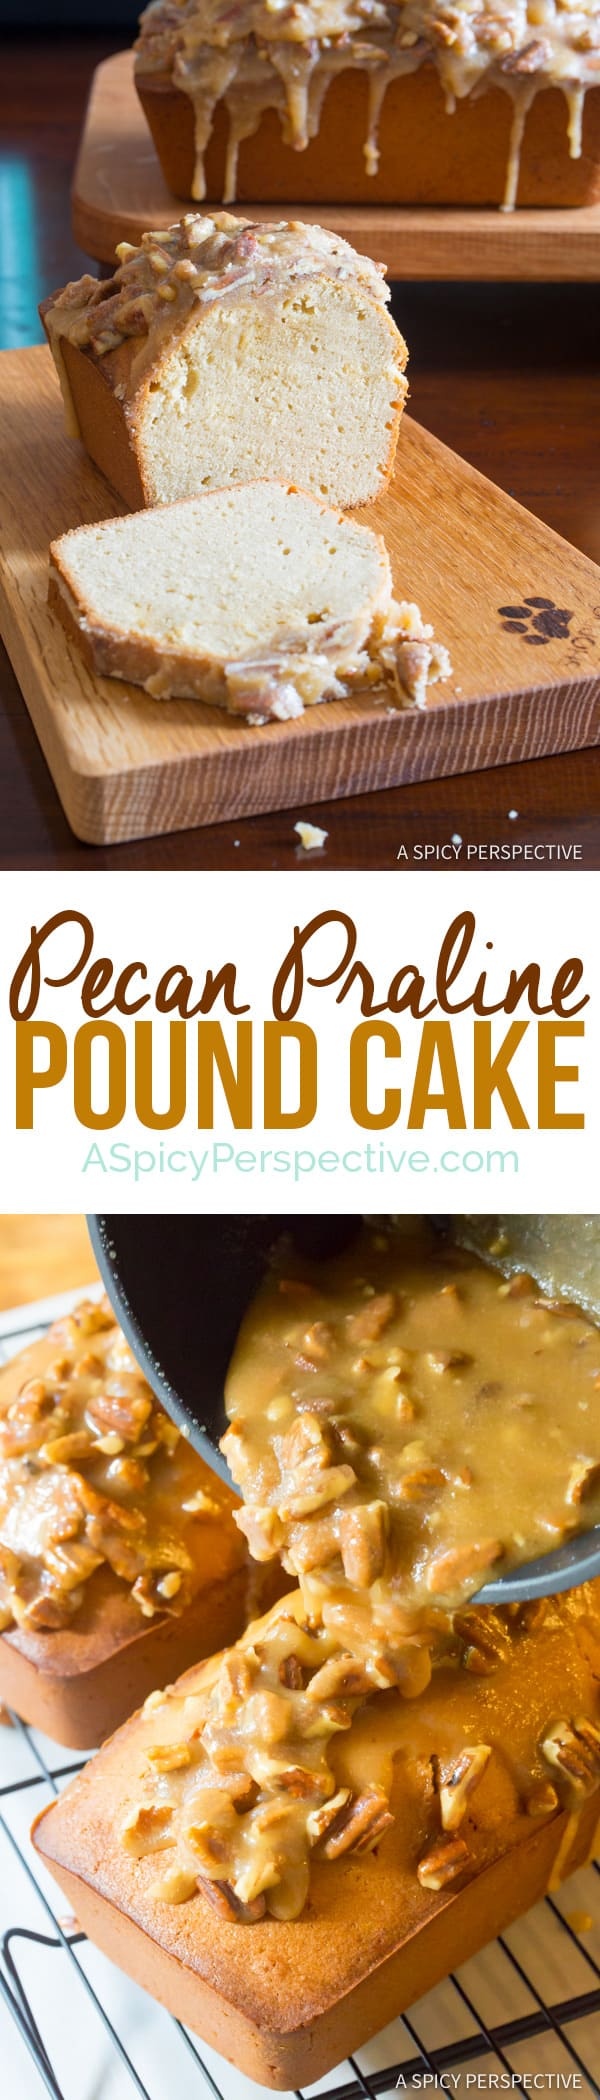 Perfect Pecan Praline Pound Cake Recipe | ASpicyPerspective.com